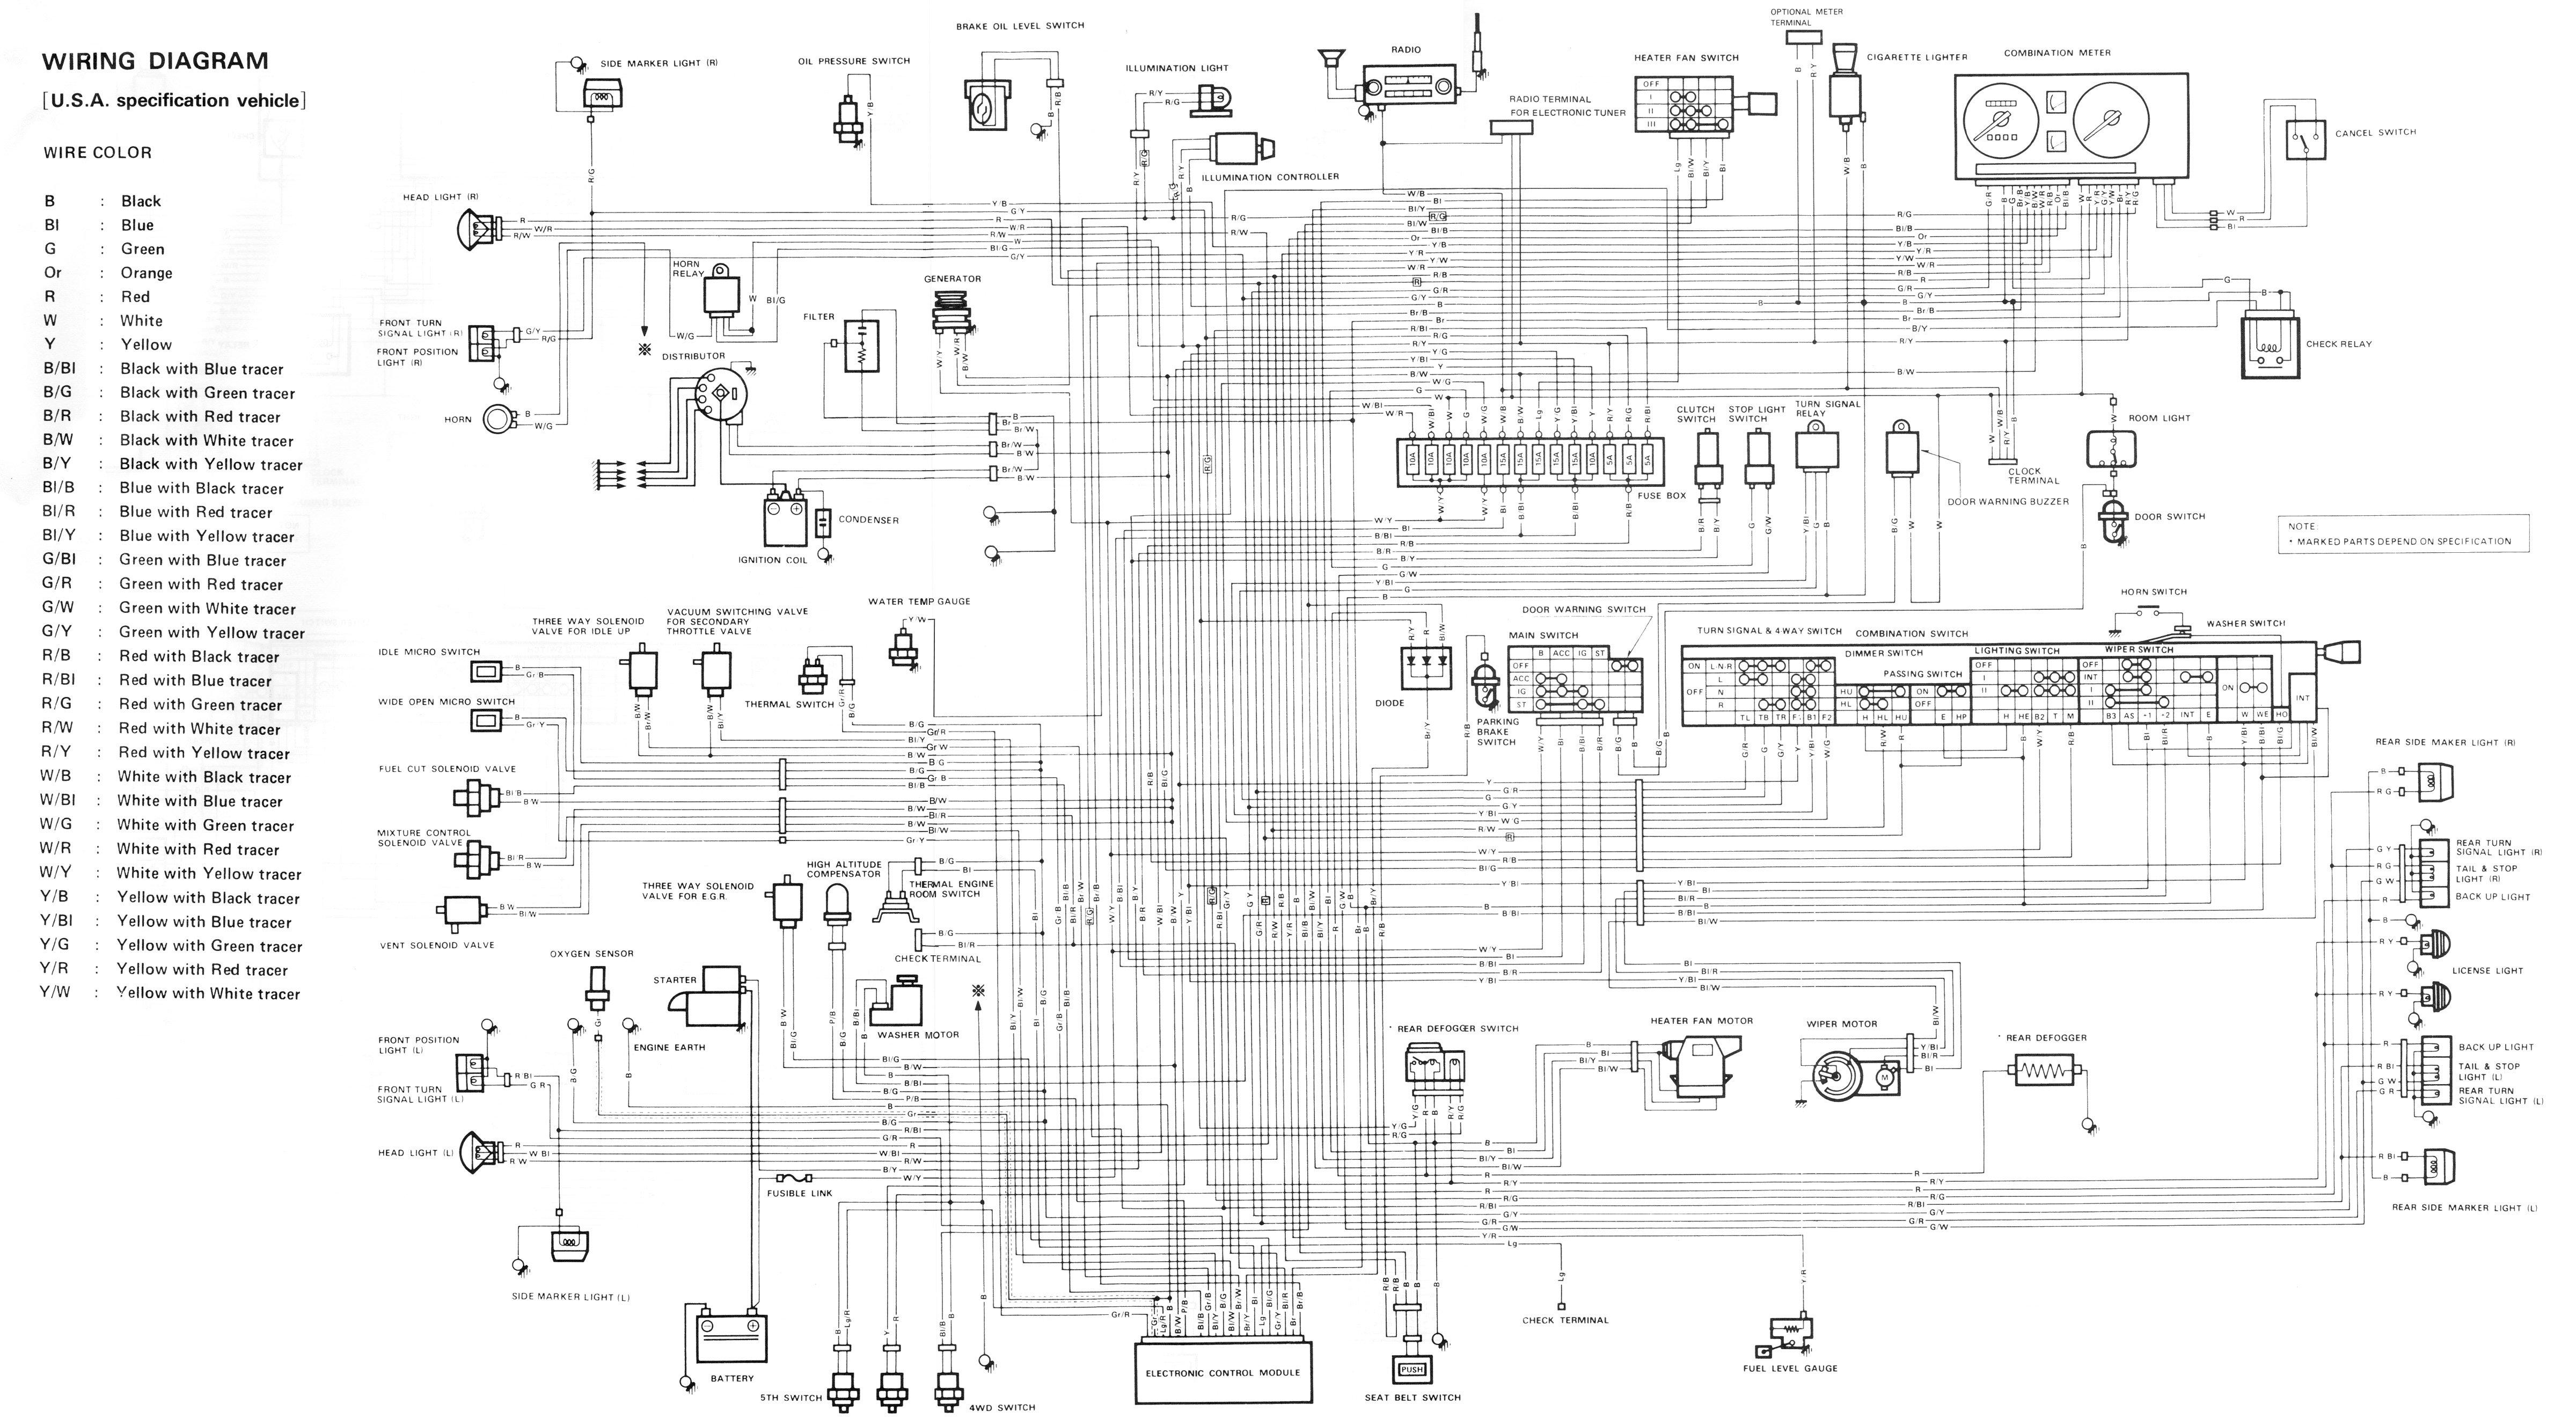 1997 Suzuki Sidekick 1600 And Sport 1800 X90 Wiring Diagram Manual